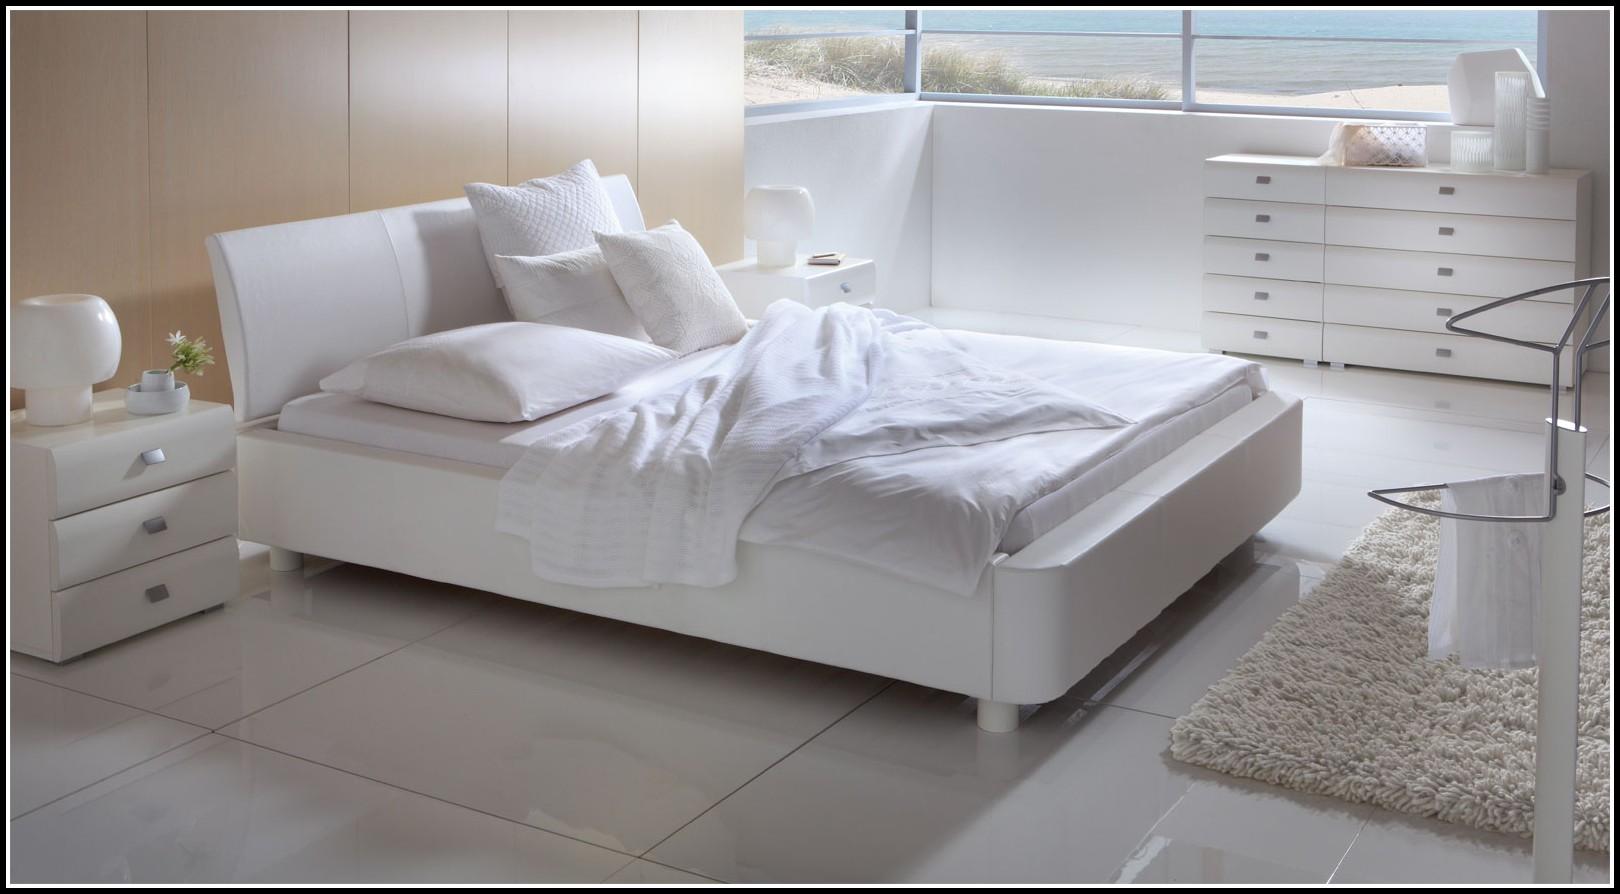 Bett Mit Bettkasten 140x200 Bett Mit Bettkasten 140x200 Ikea